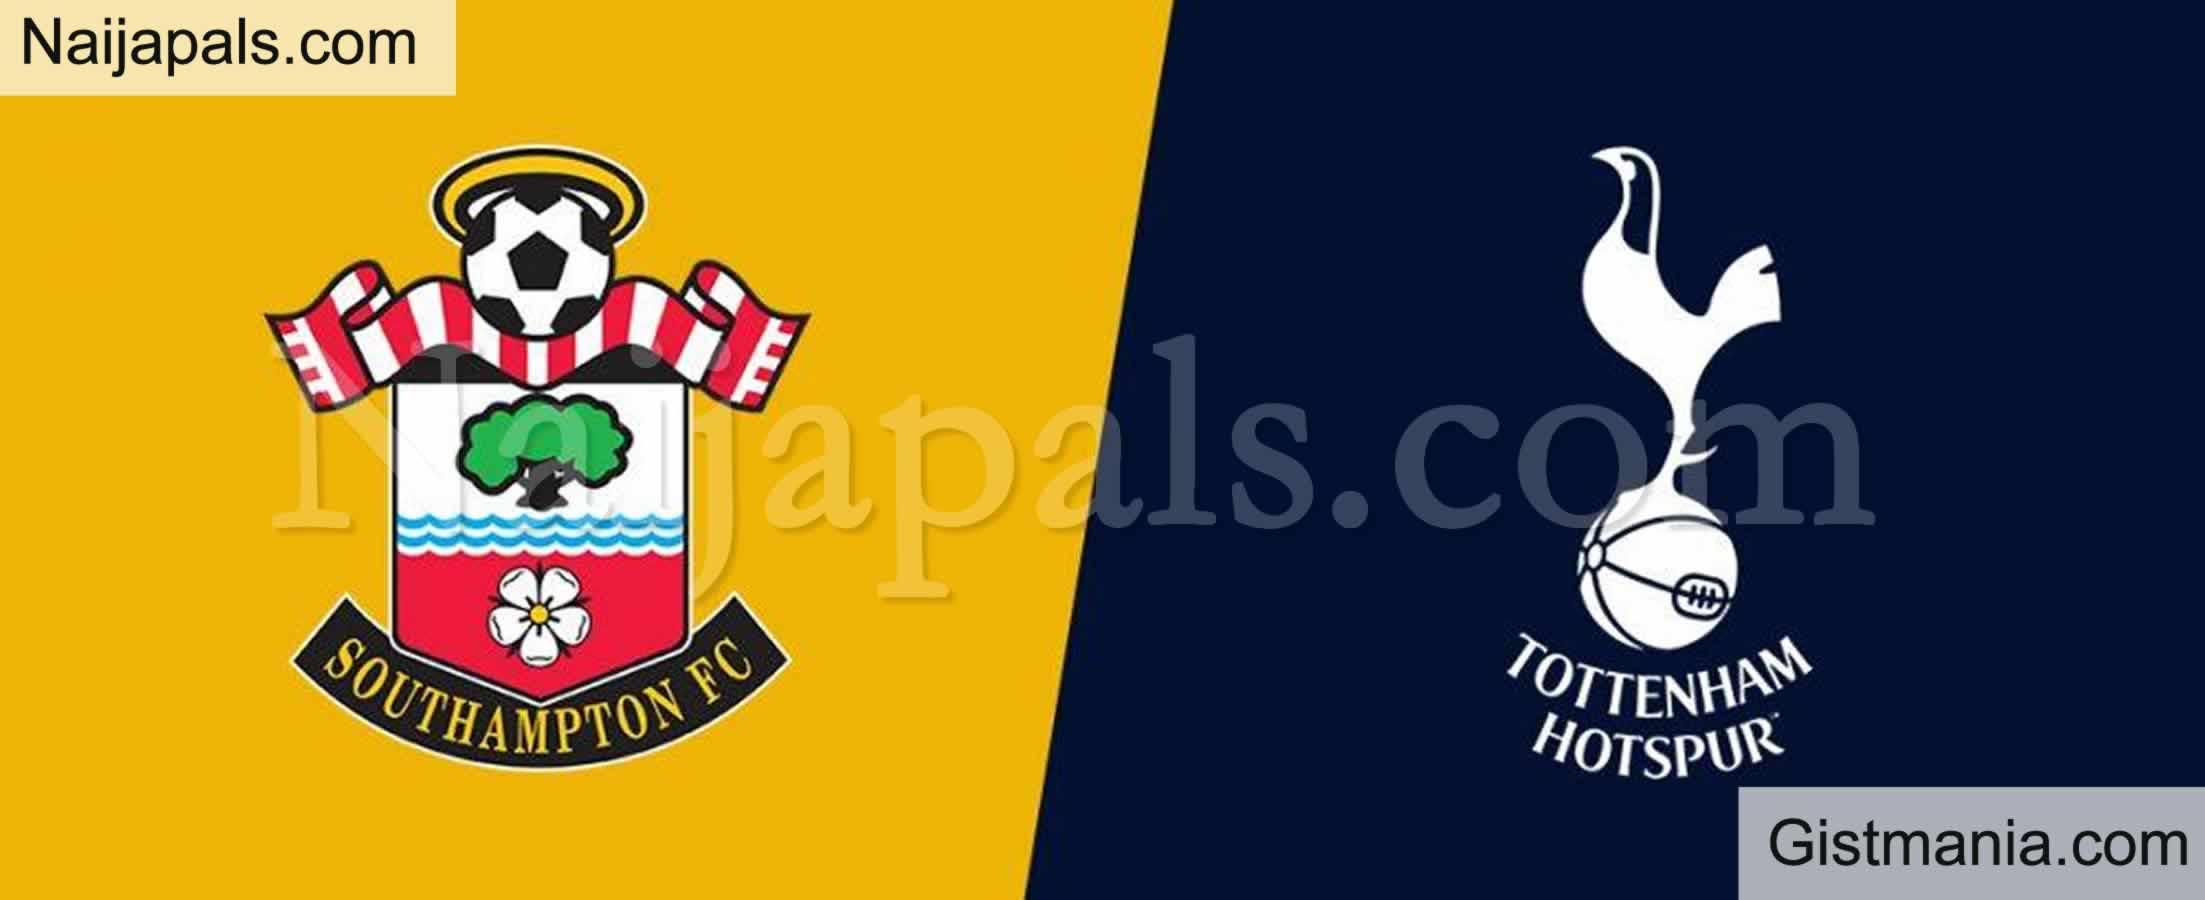 <img alt='.' class='lazyload' data-src='https://img.gistmania.com/emot/soccer.gif' /> <b>Southampton v Tottenham: English Premier League Match, Team News, Goal Scorers and Stats</b>